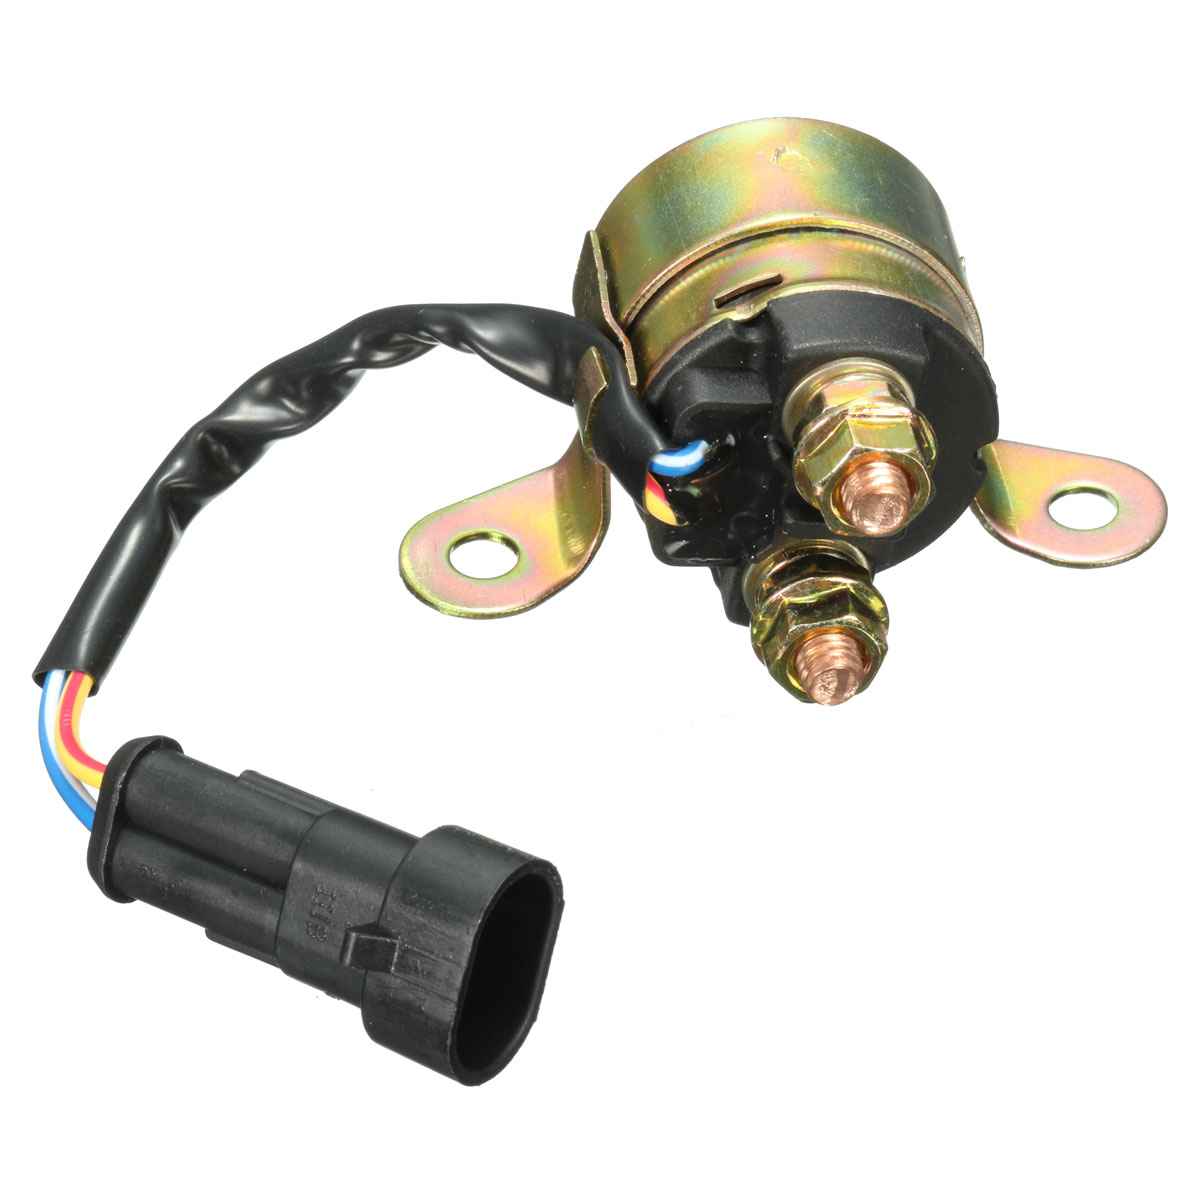 yamaha atv starter solenoid wiring diagram boat battery disconnect switch relay start for polaris rzr 800 efi